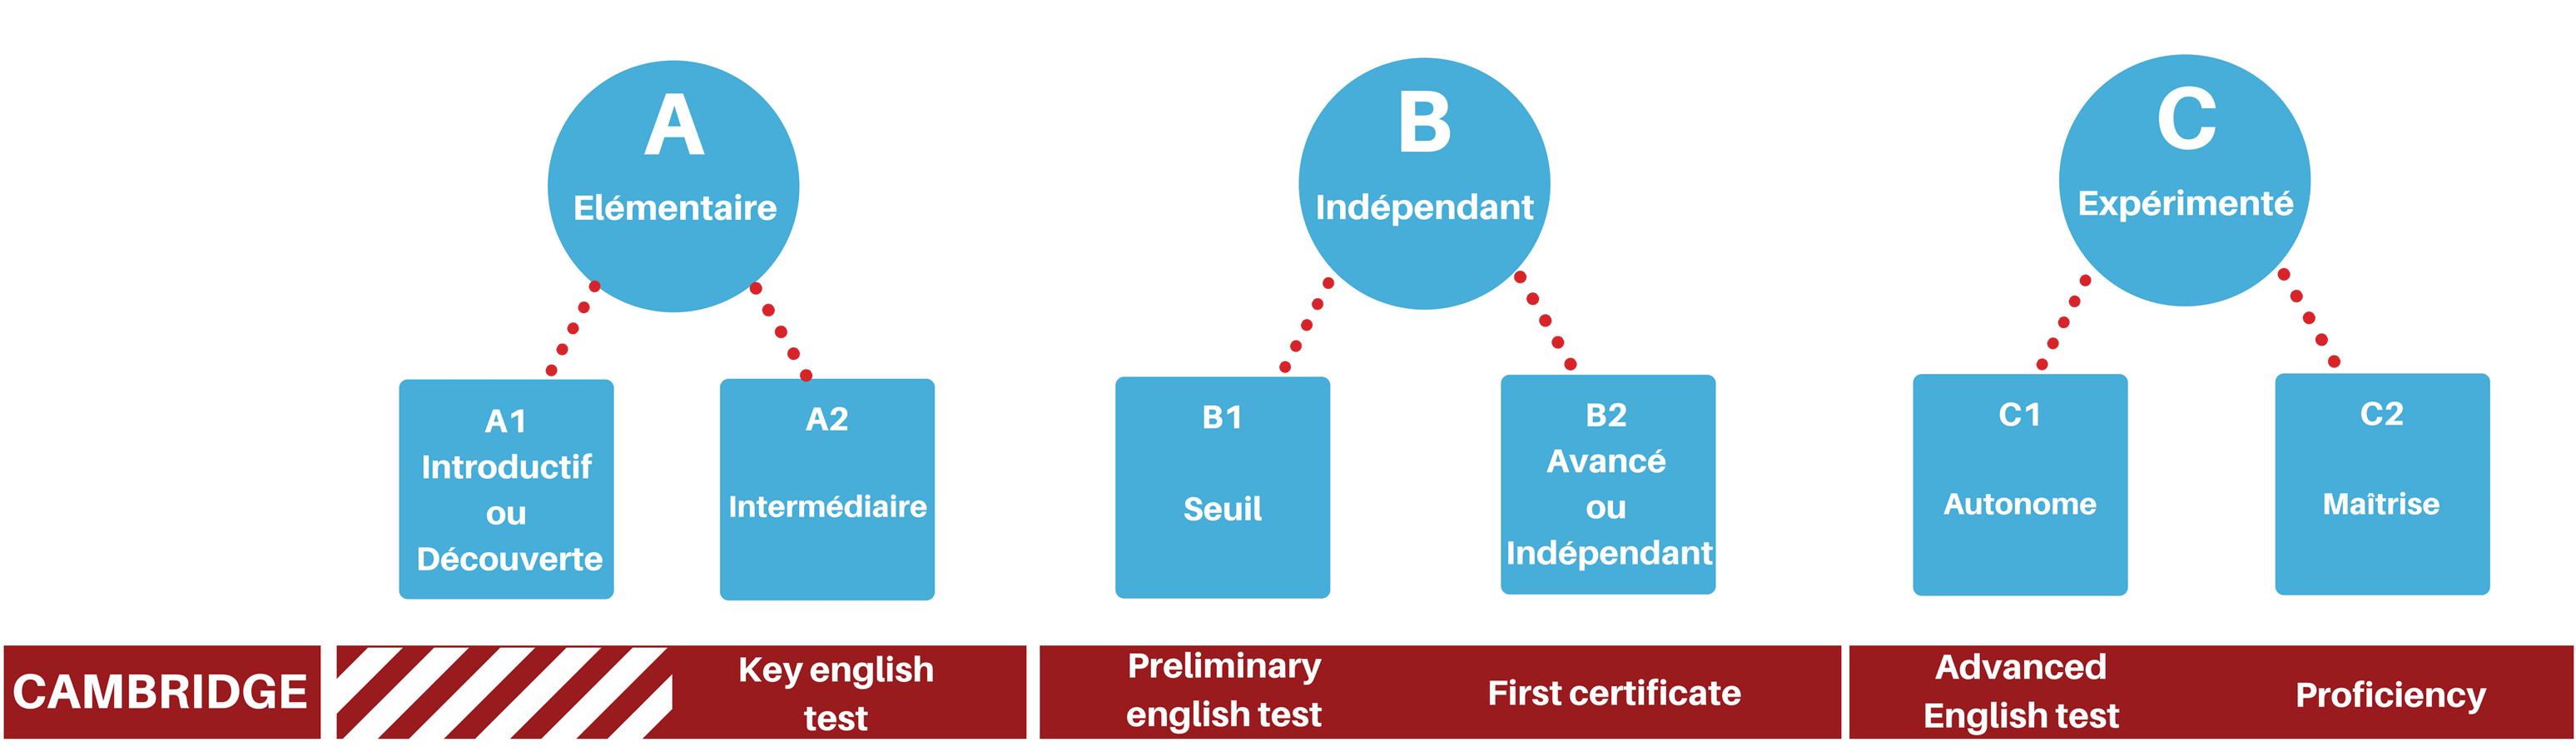 Score notation certifications Cambridge VICTORIA'S English